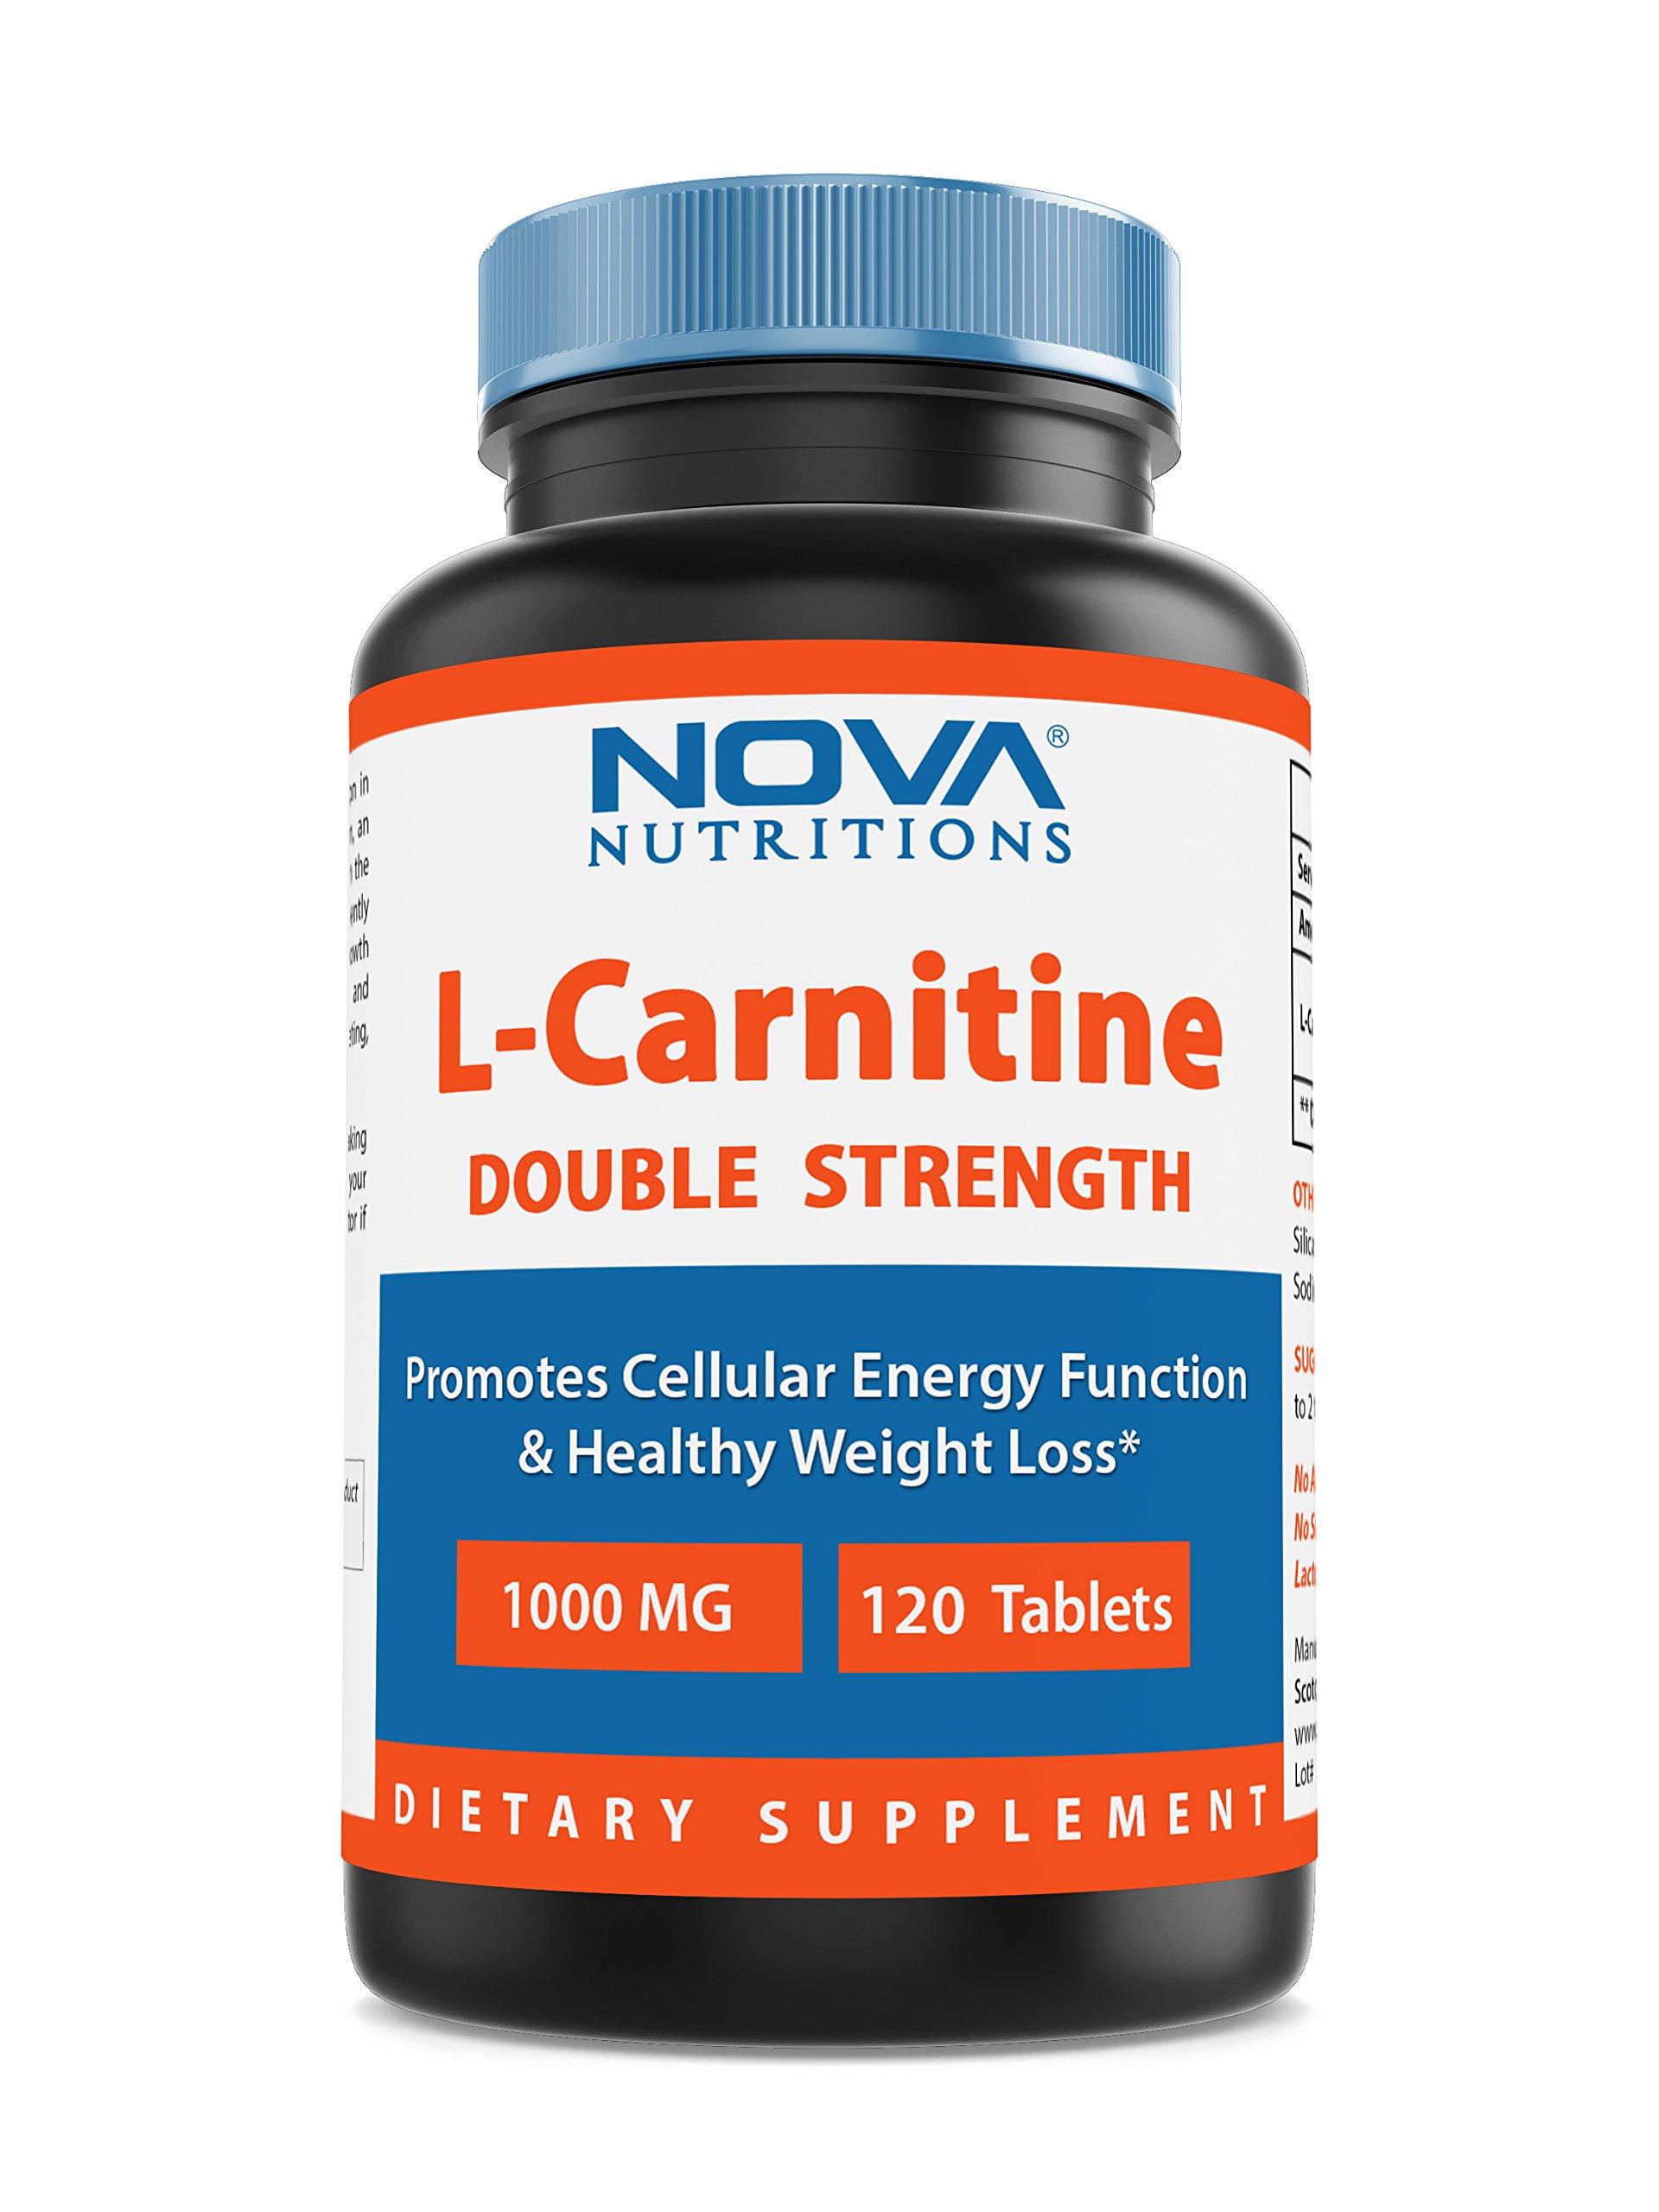 Nova Nutritions L-Carnitine 1000 mg 120 Tablets